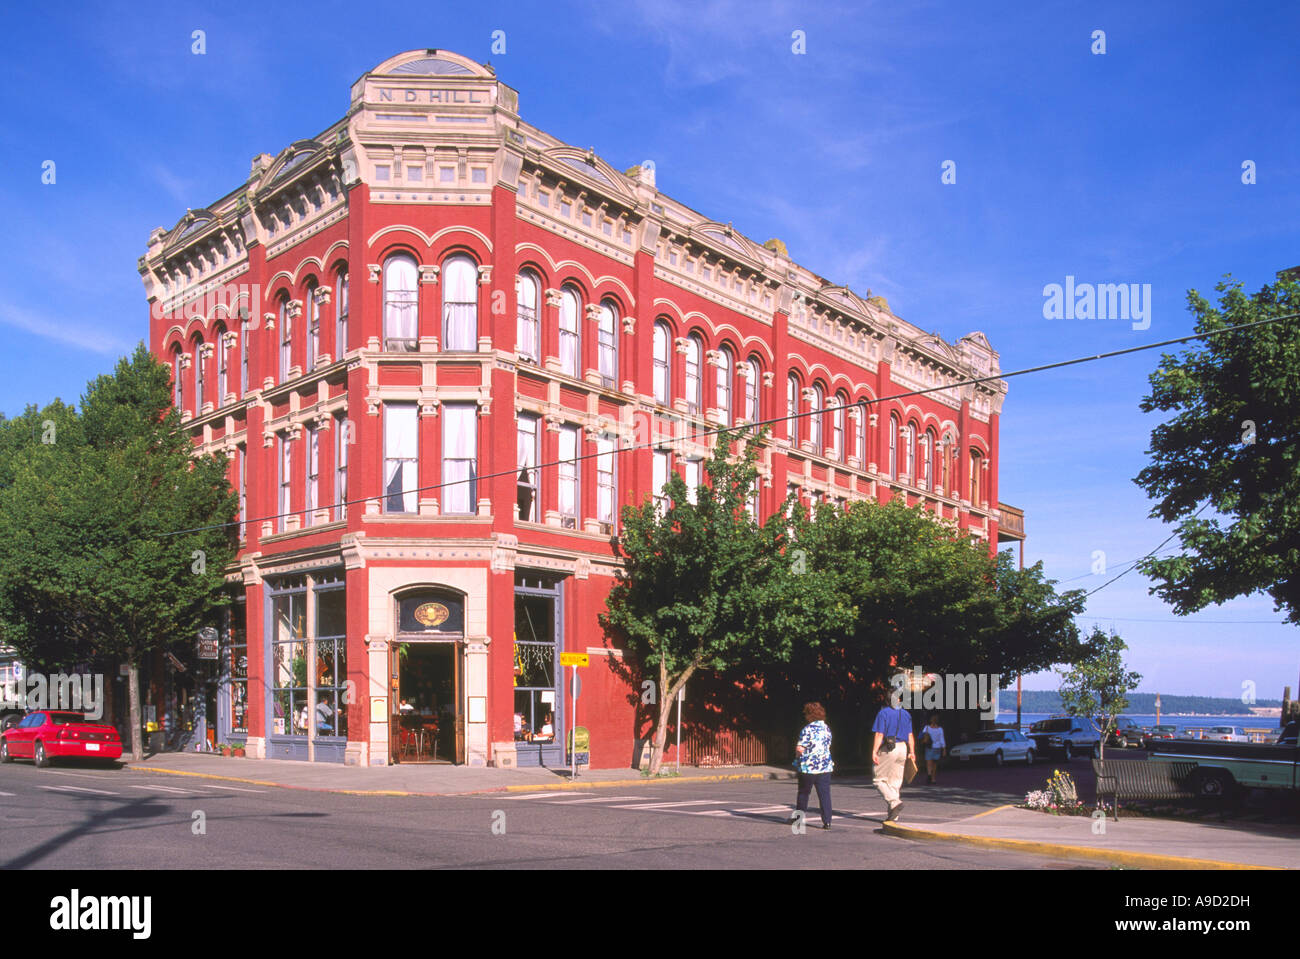 Washington State Historical Buildings